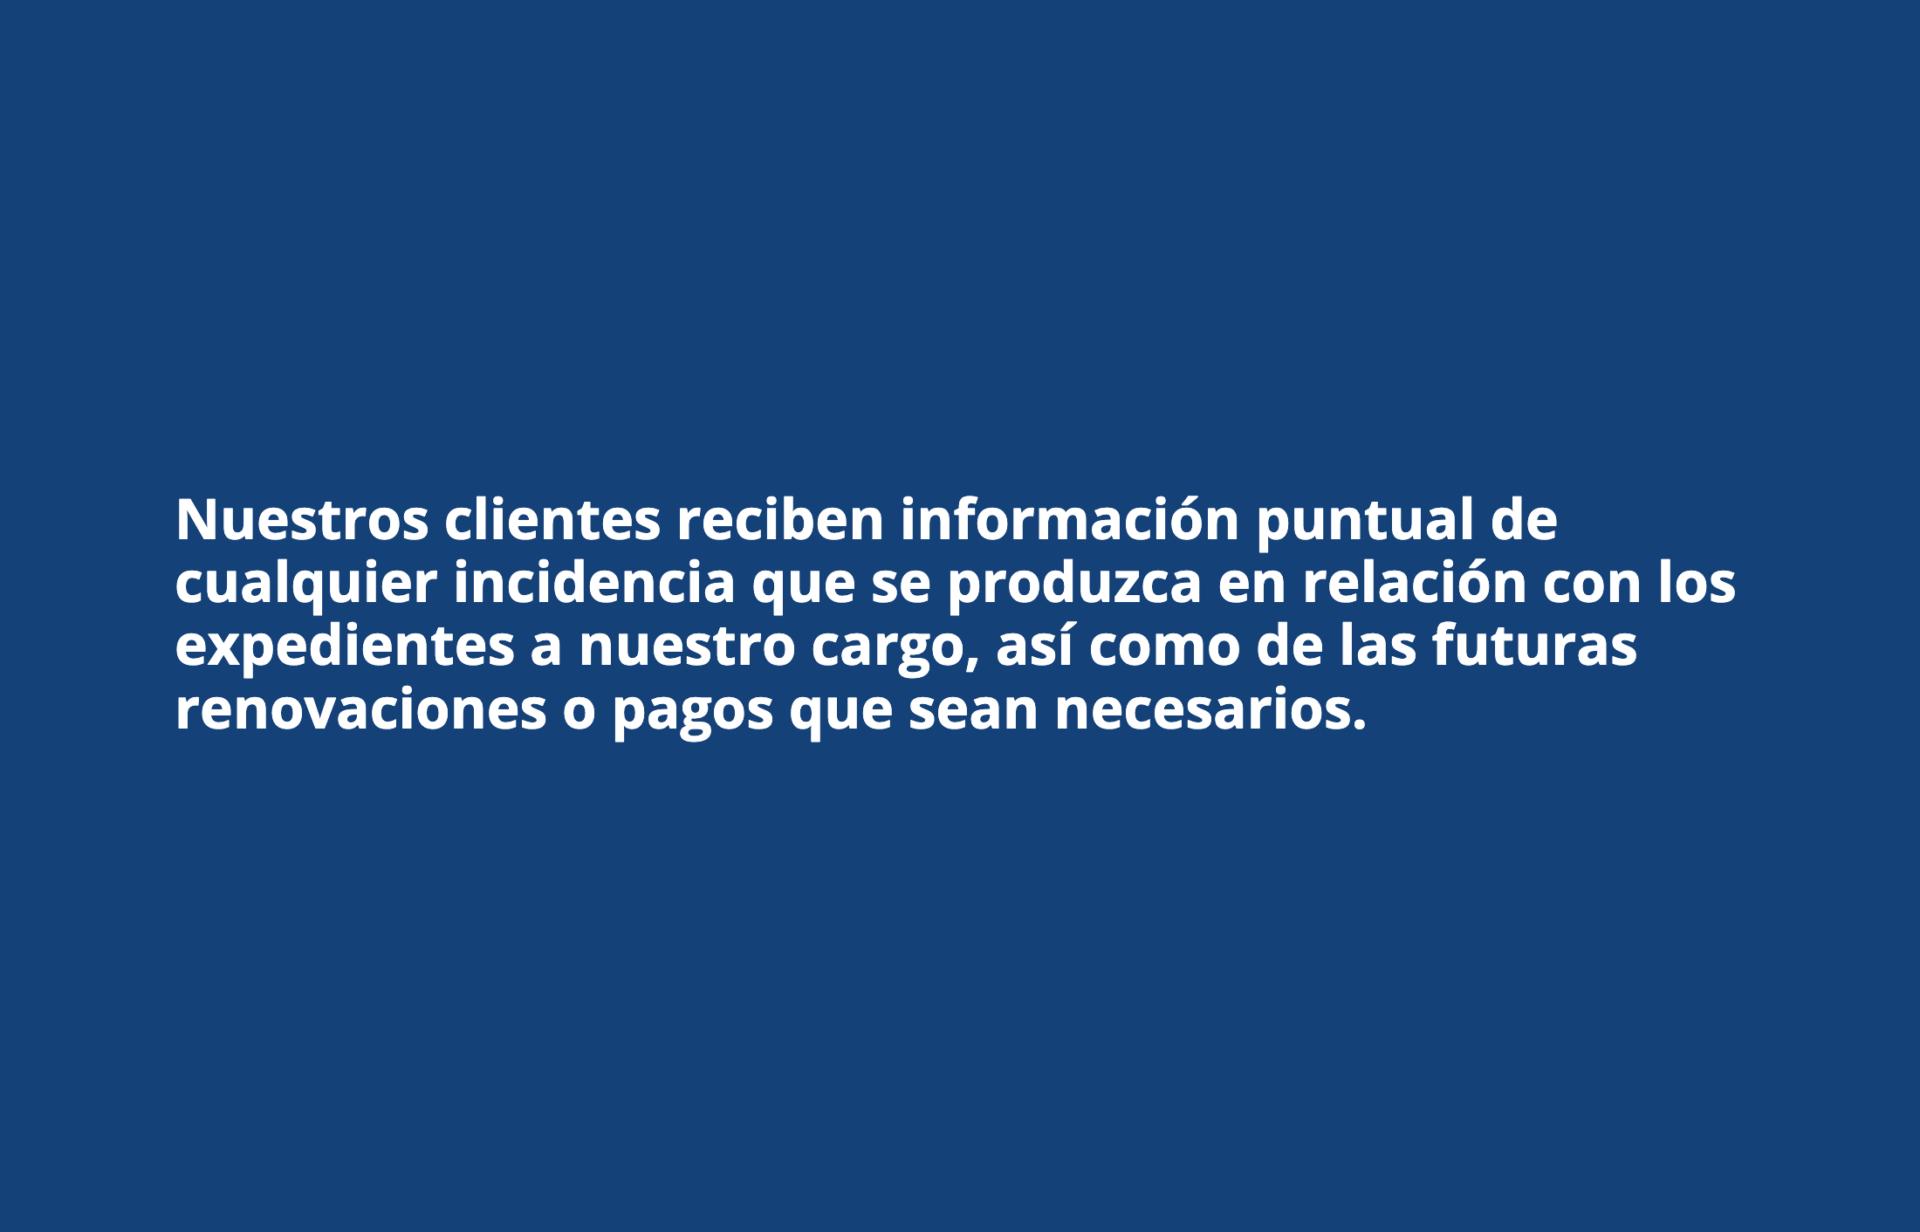 ipamark-servicio-text 02